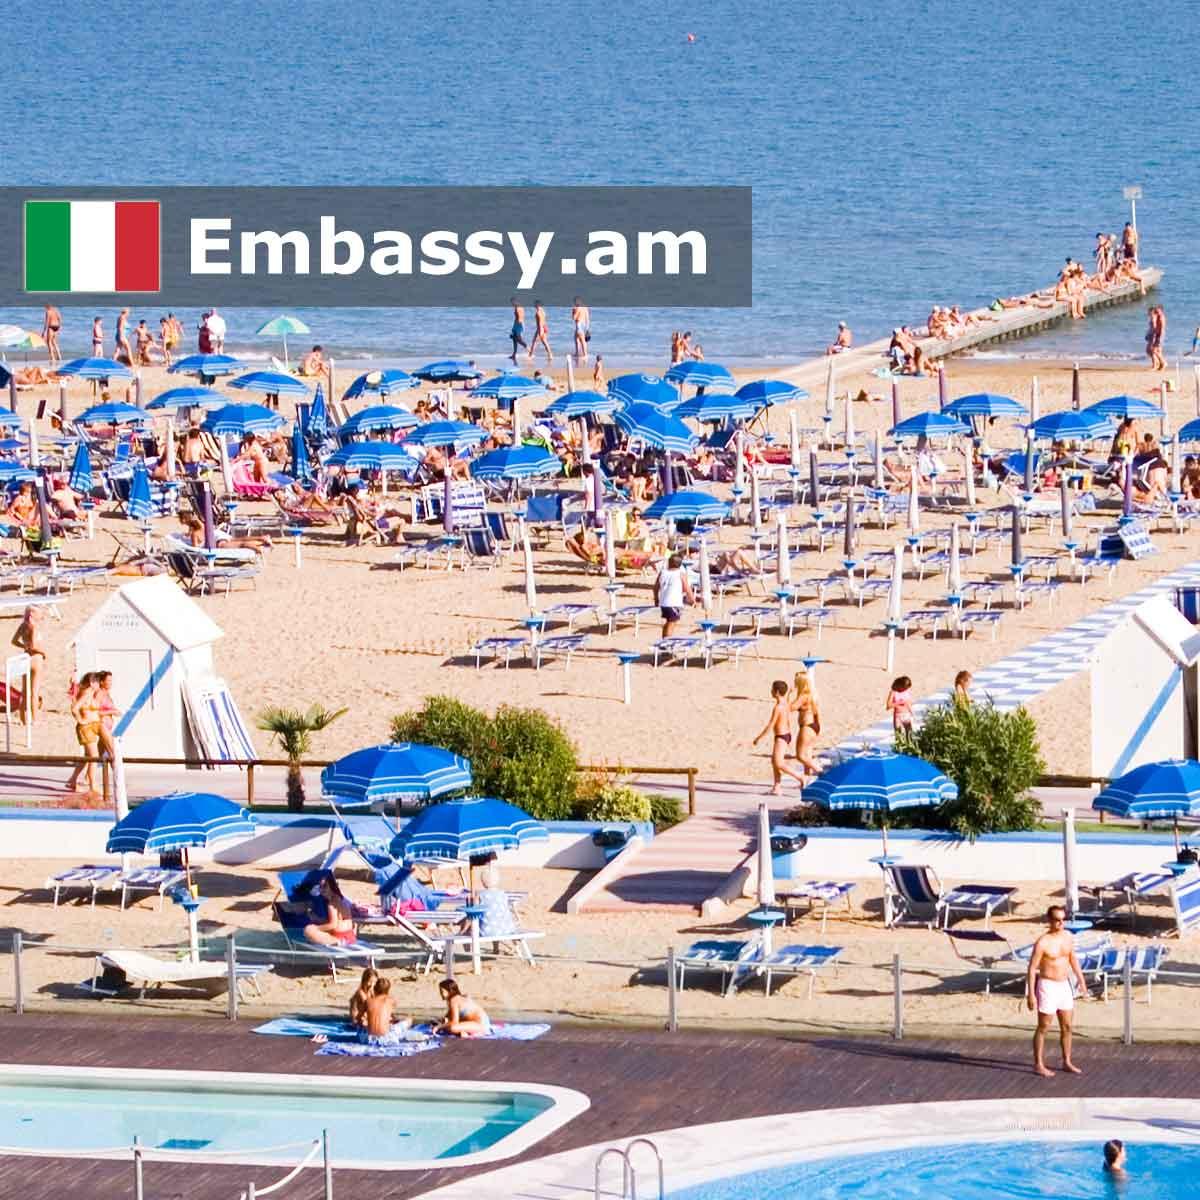 Lido di Jesolo - Hotels in Italy - Embassy.am